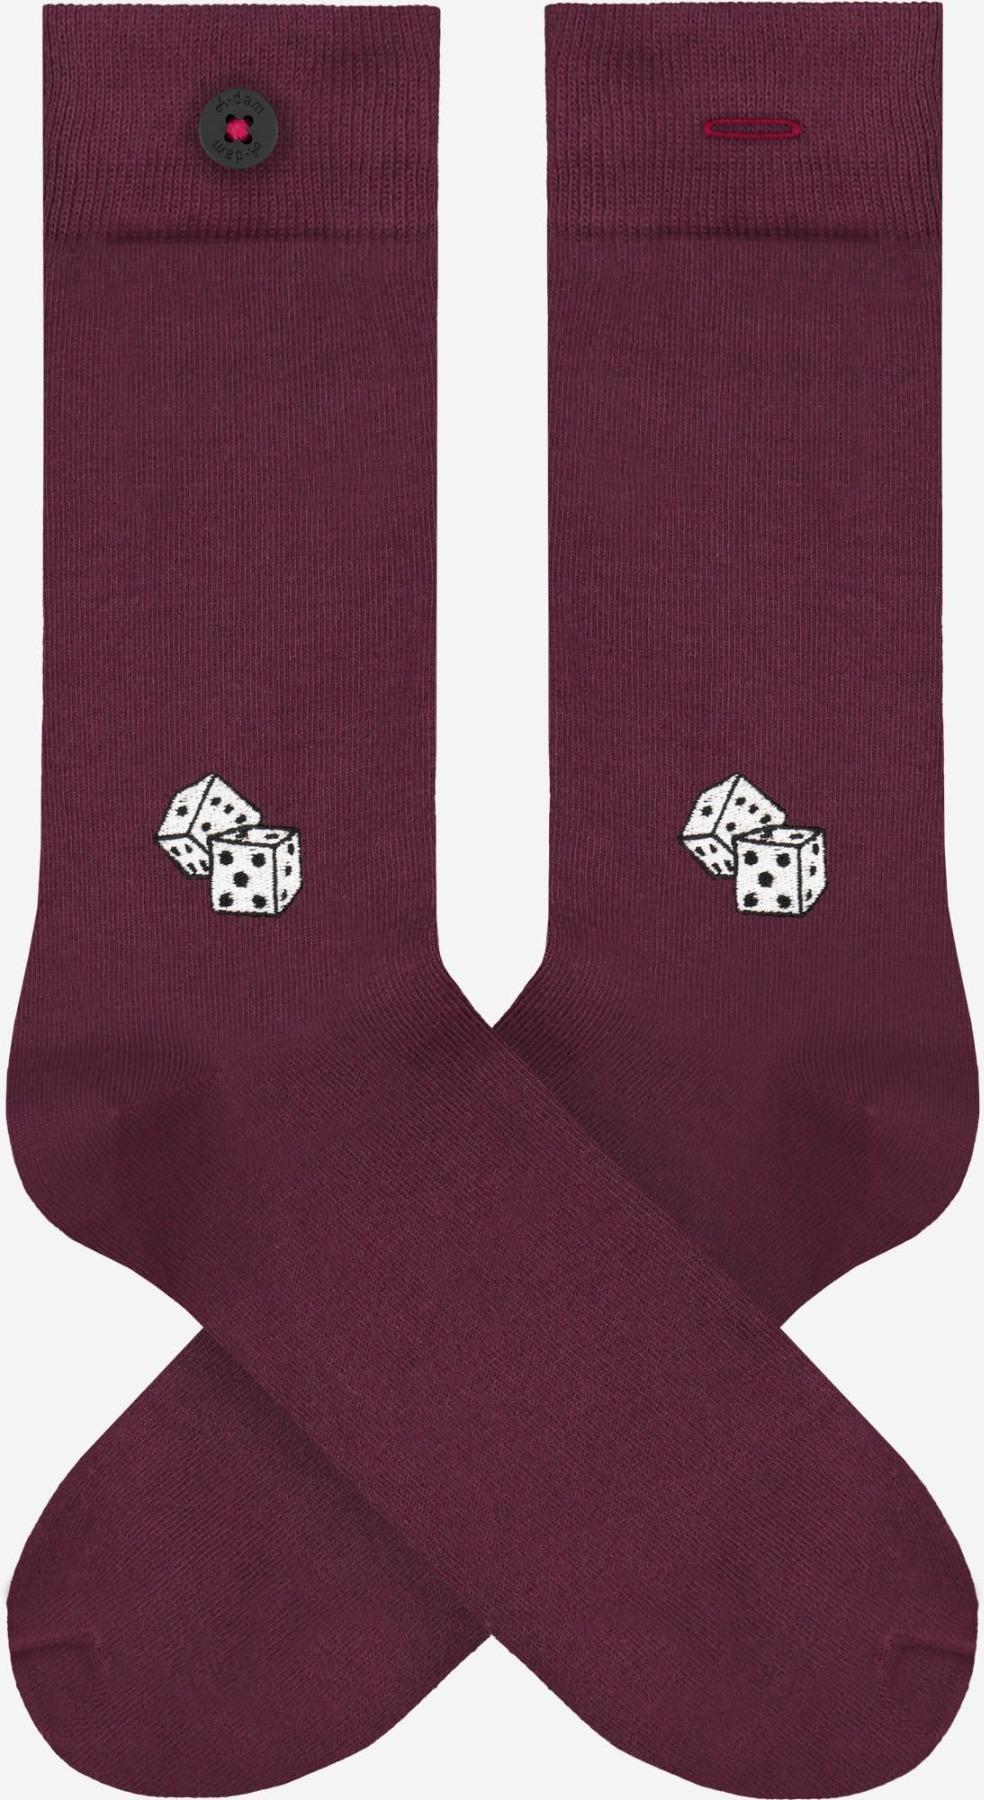 A-dam - Socken BRICE - Bordeaux